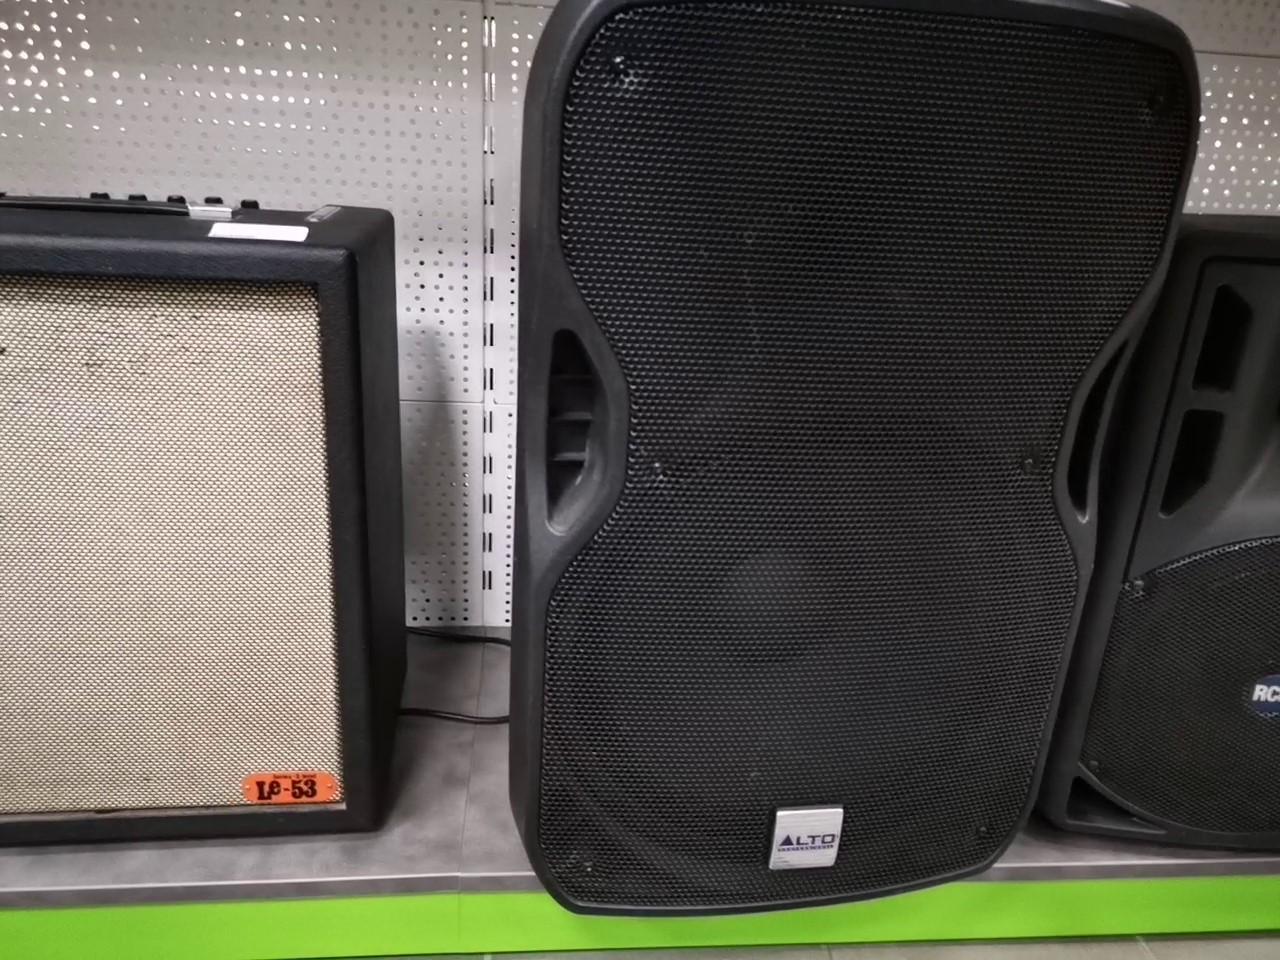 Alto ts 115 A speaker